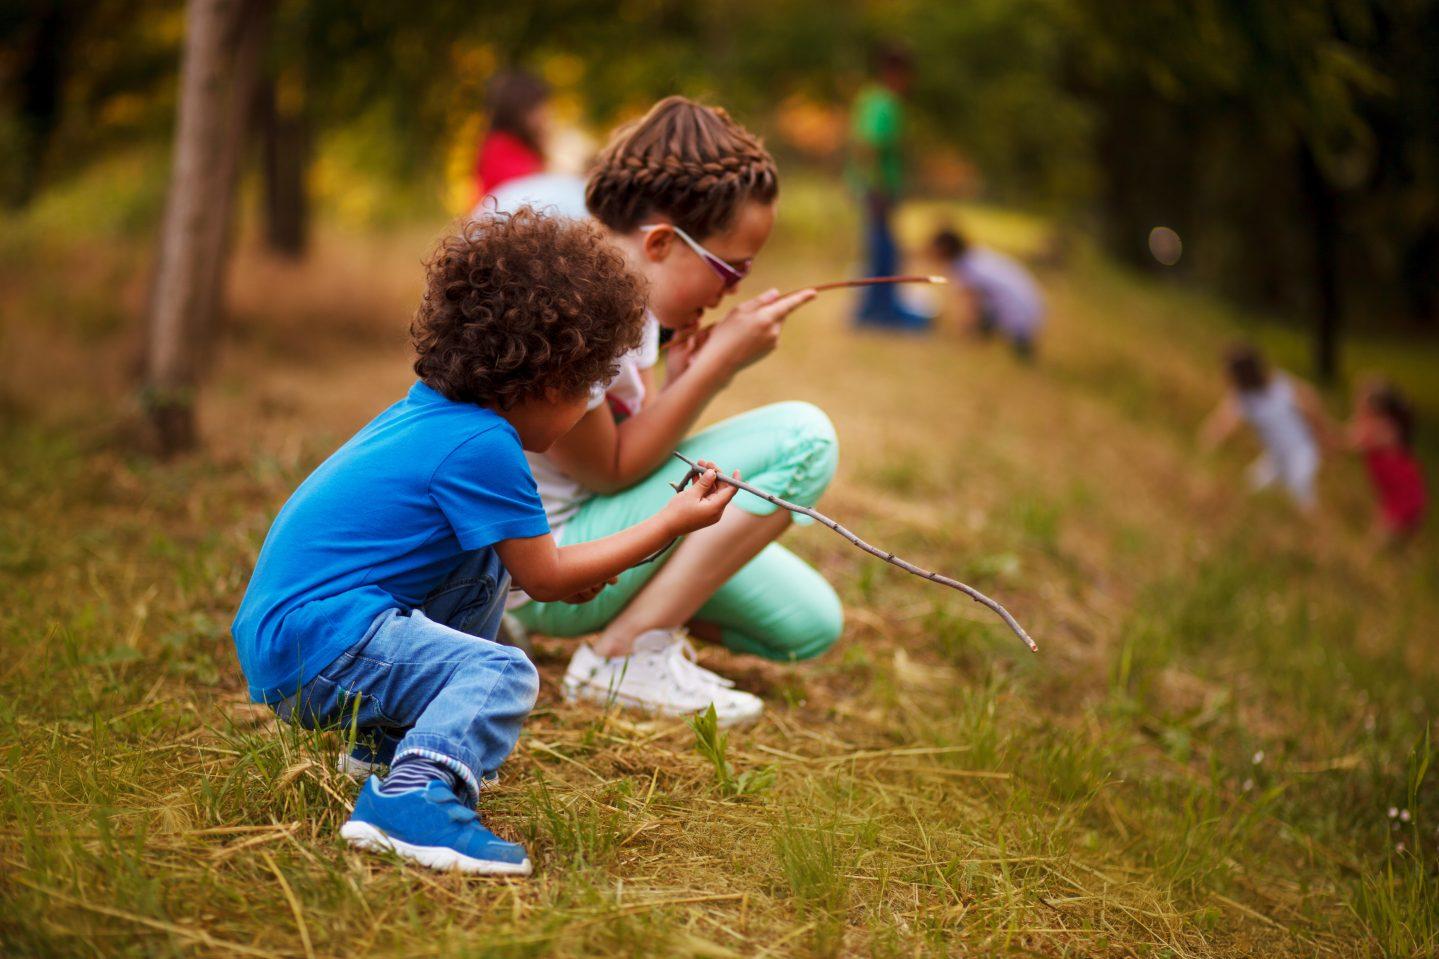 Kinder- Und Jugendtherapeut Ausbildung